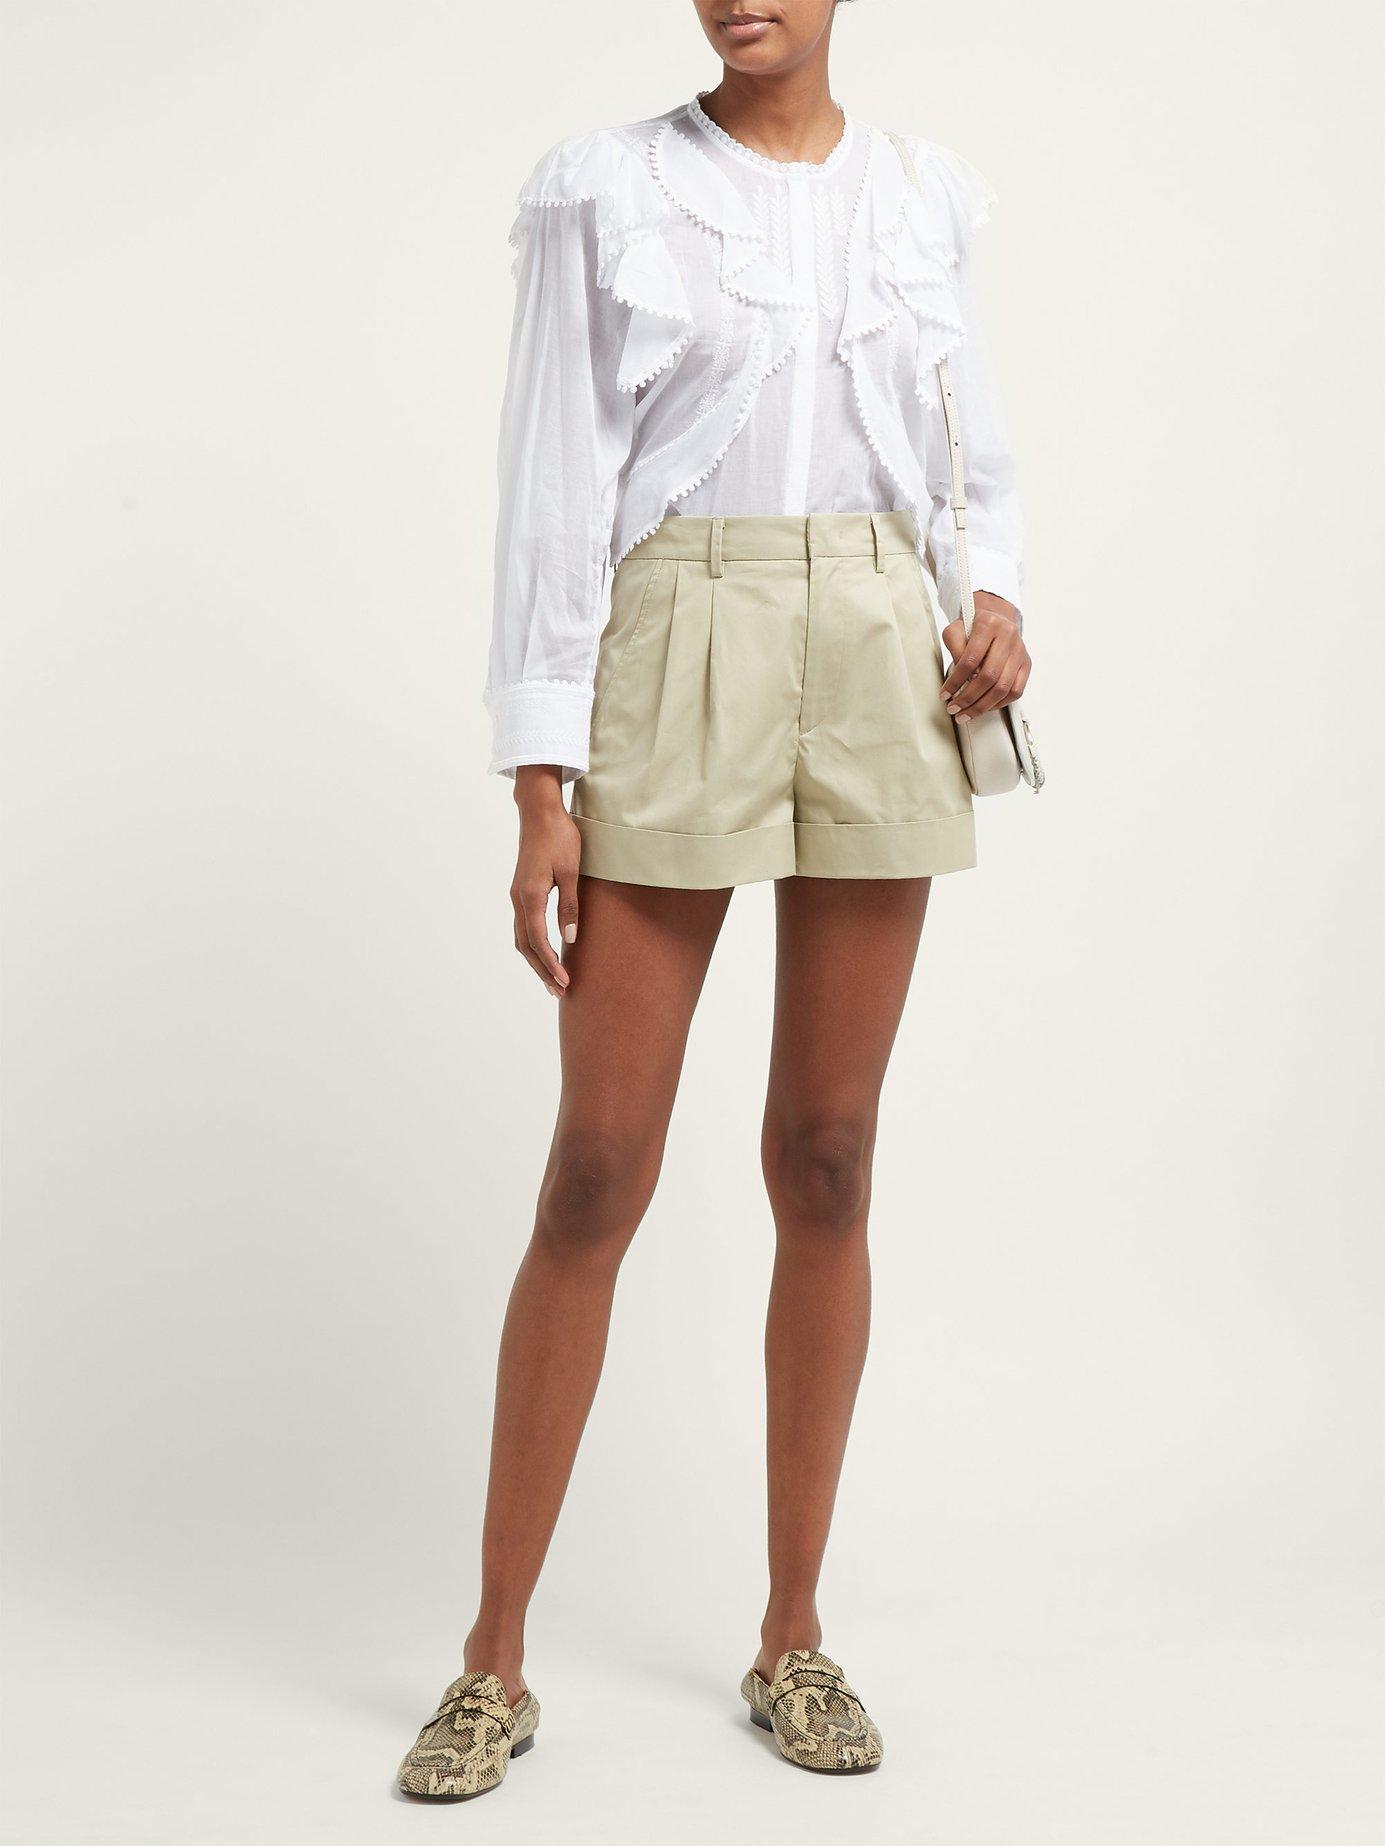 cd6376662f320 Lyst - Étoile Isabel Marant Alea Ruffled Cotton Blouse in White